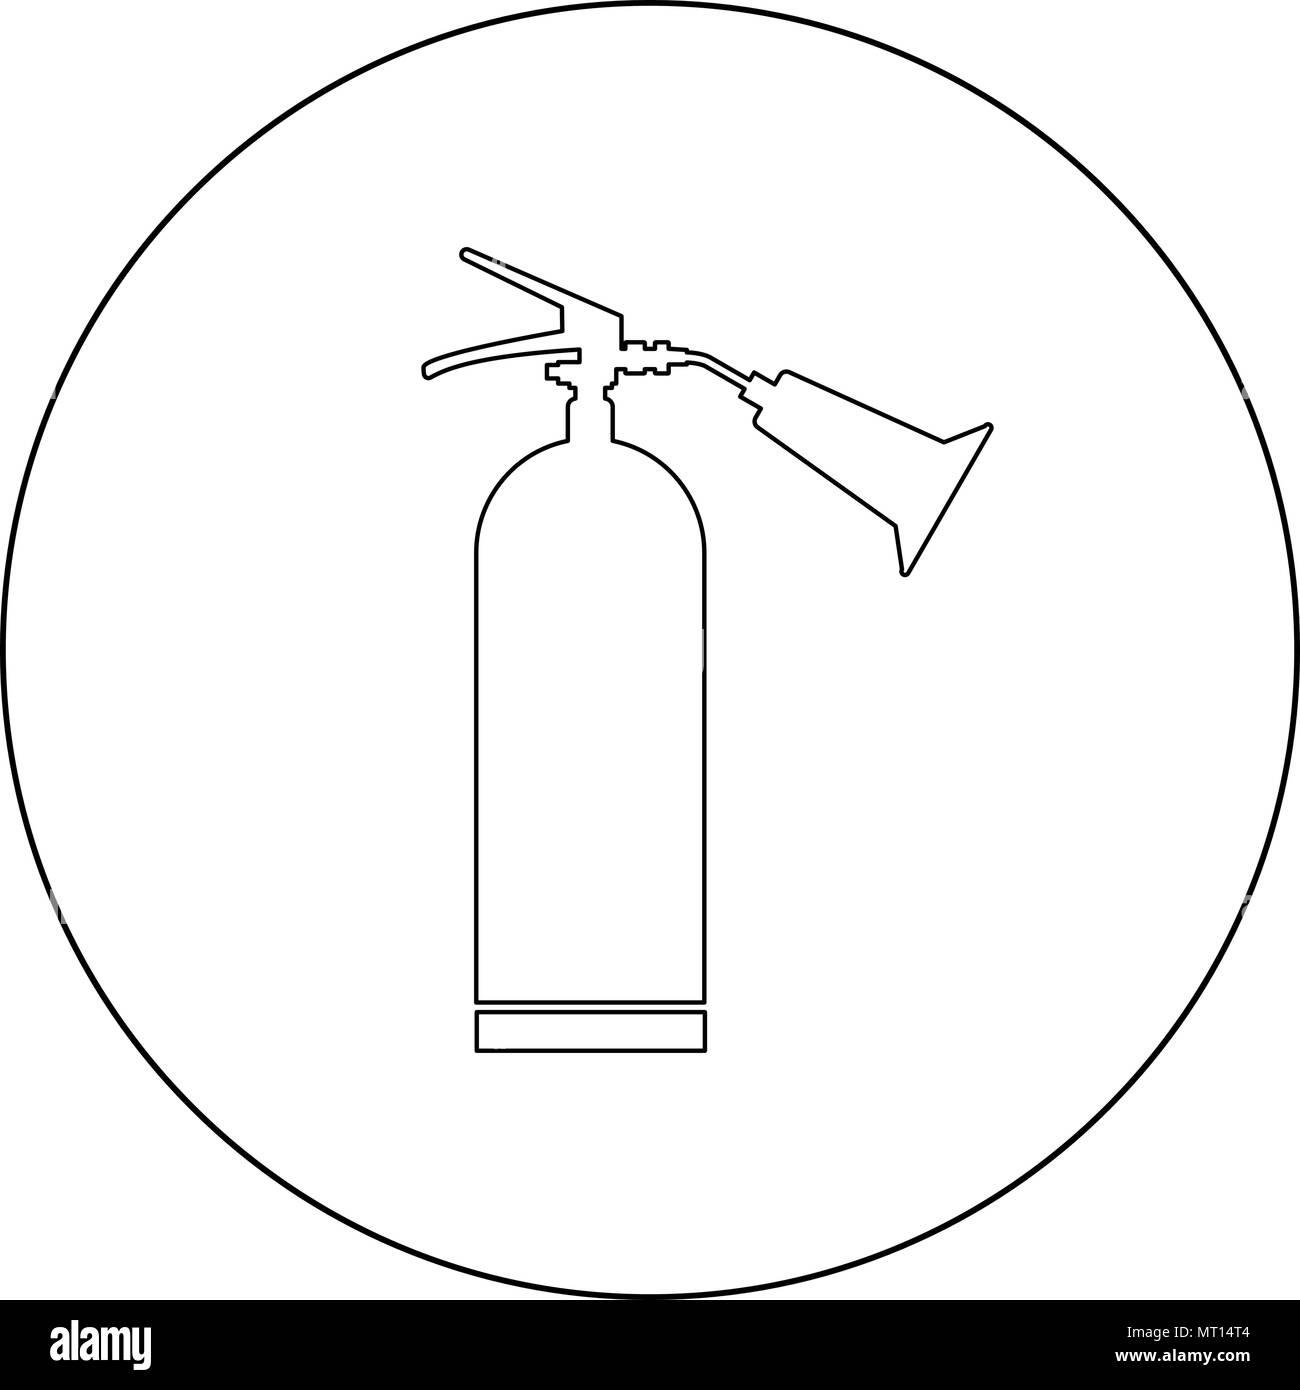 Fire Extinguisher Symbol Stock Photos & Fire Extinguisher